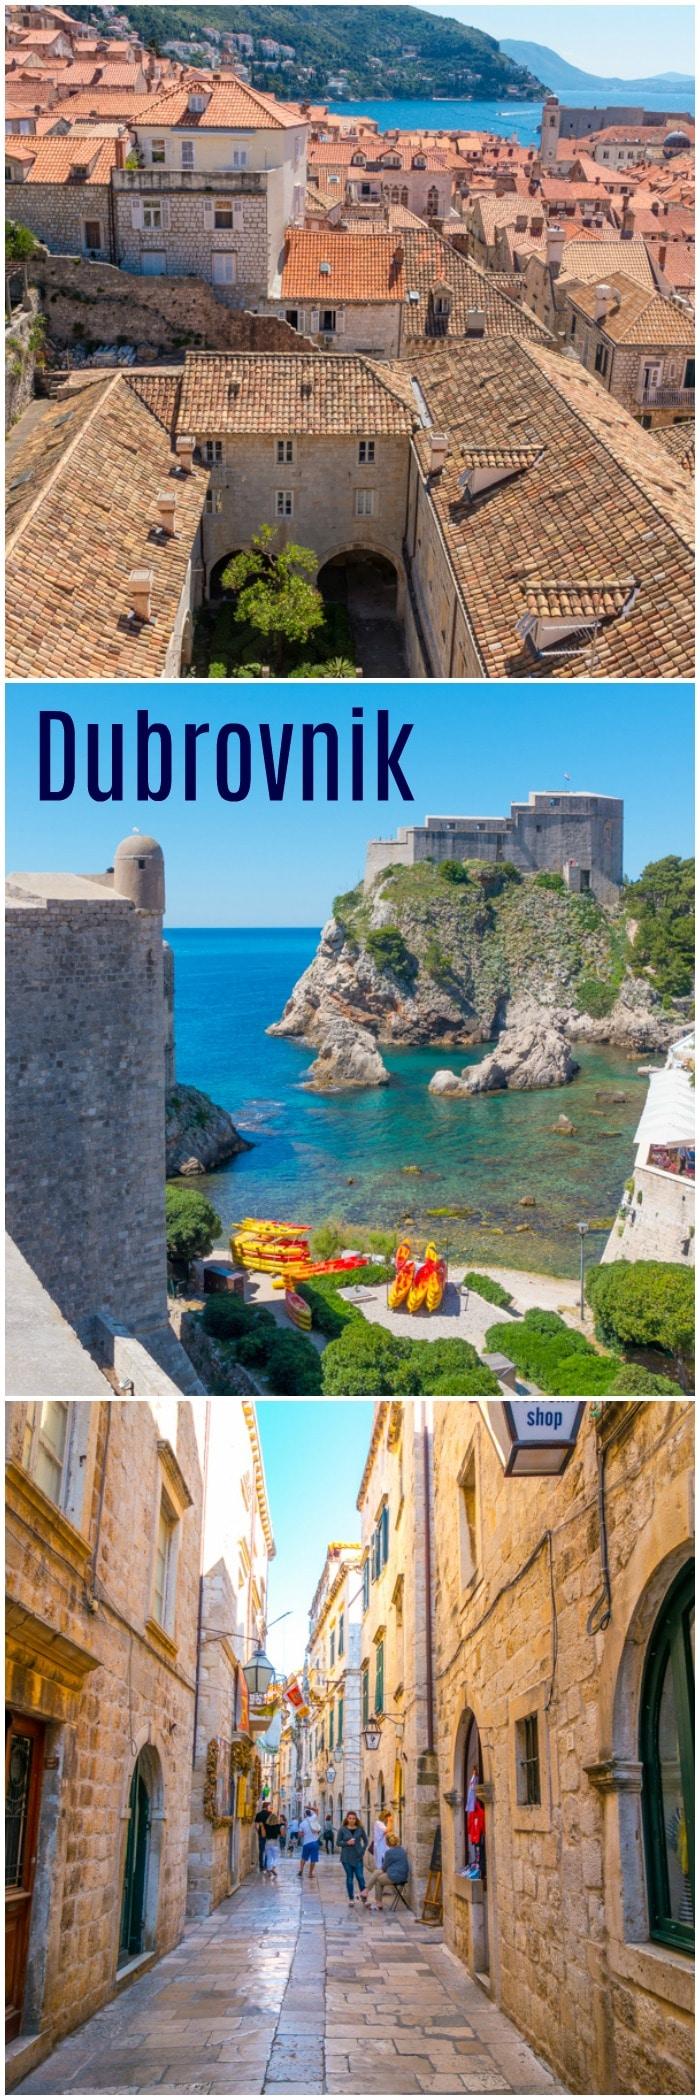 The Best Things To Do In Dubrovnik, Croatia #travel #bucketlist